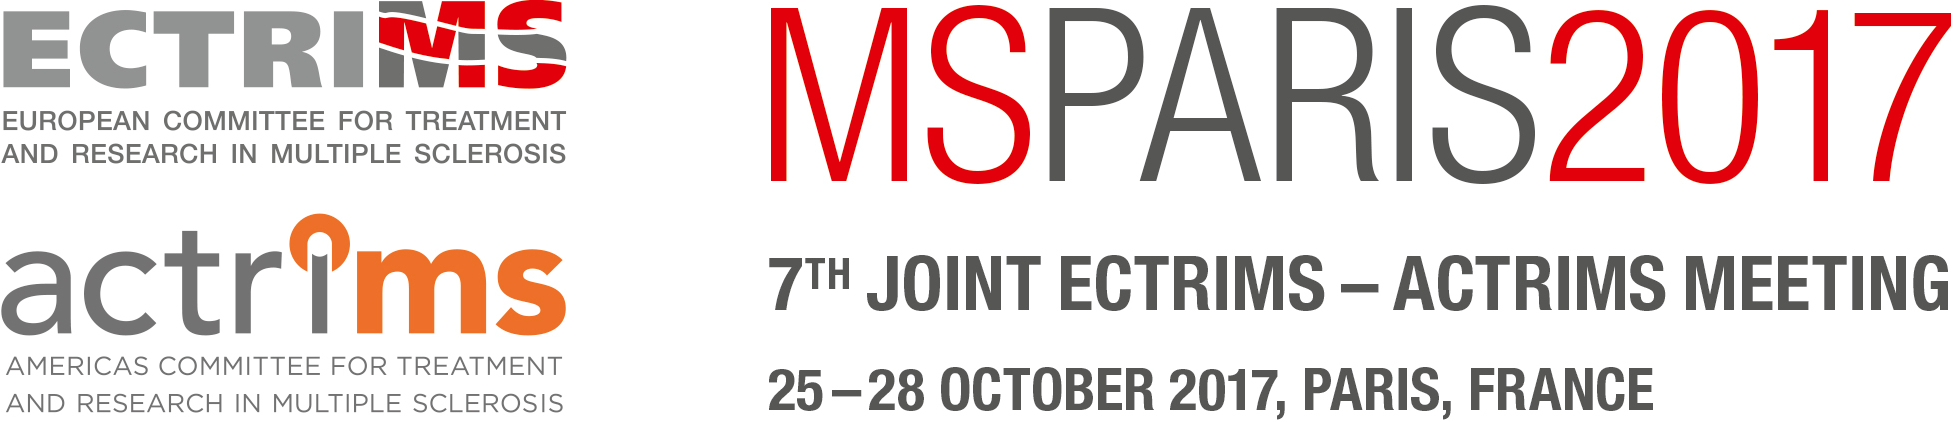 7th Joint ECTRIMS ACTRIMS Meeting